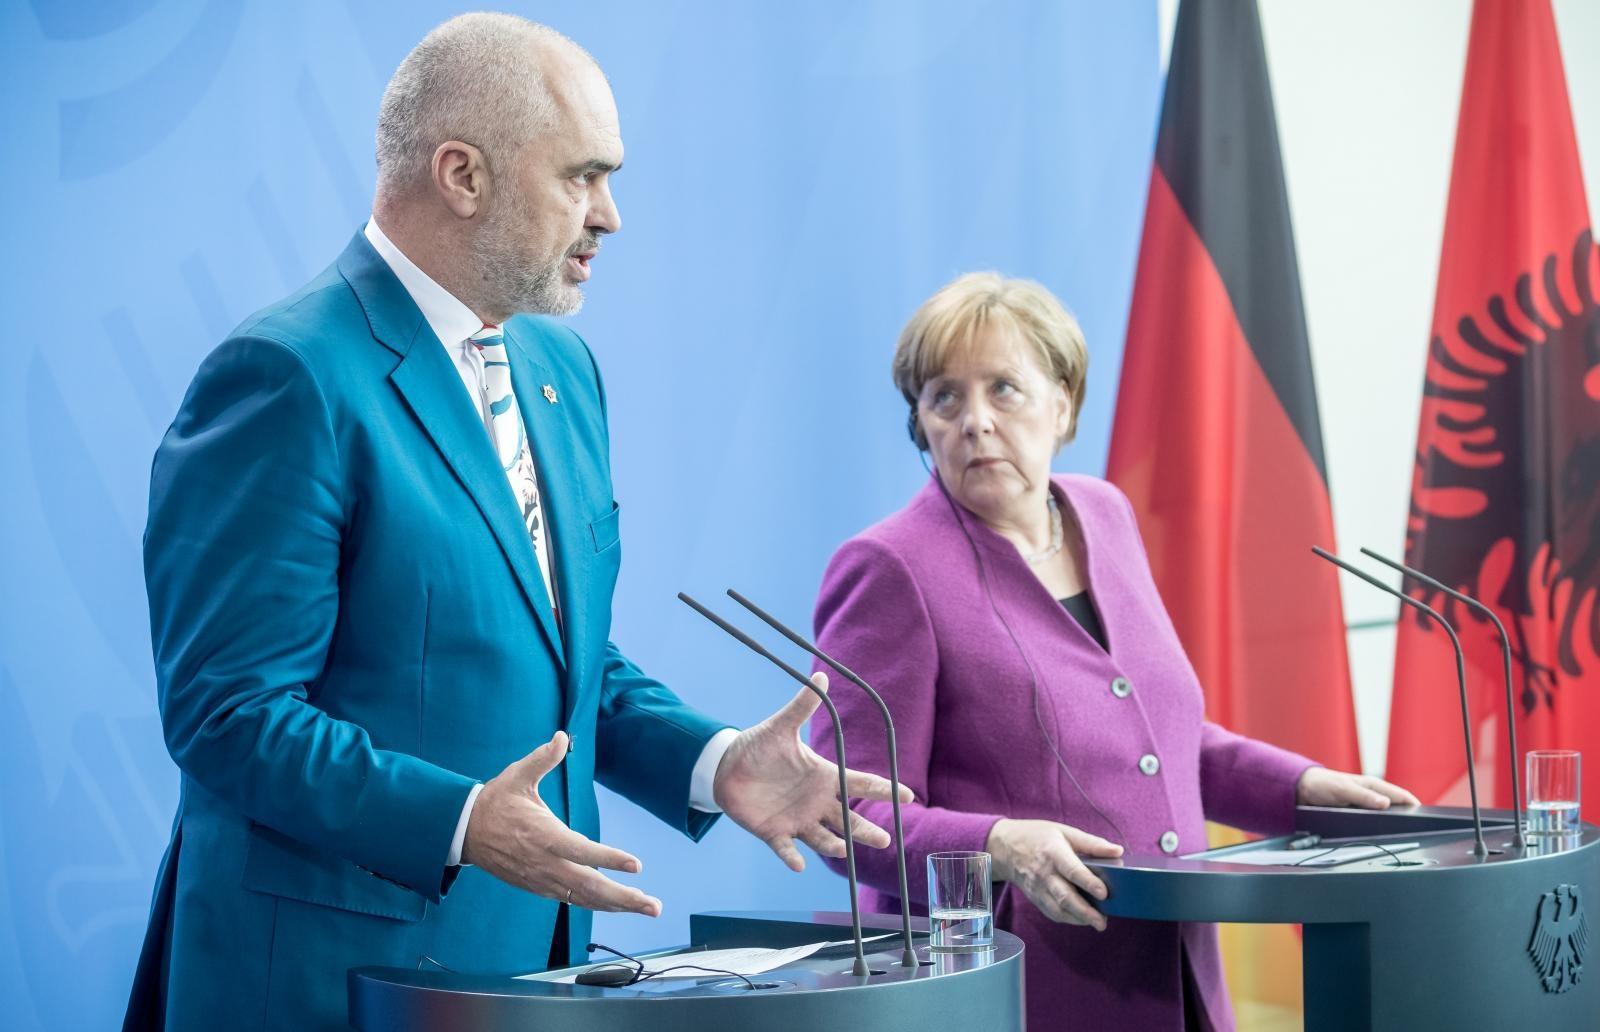 Edi Rama in Angela Merkel